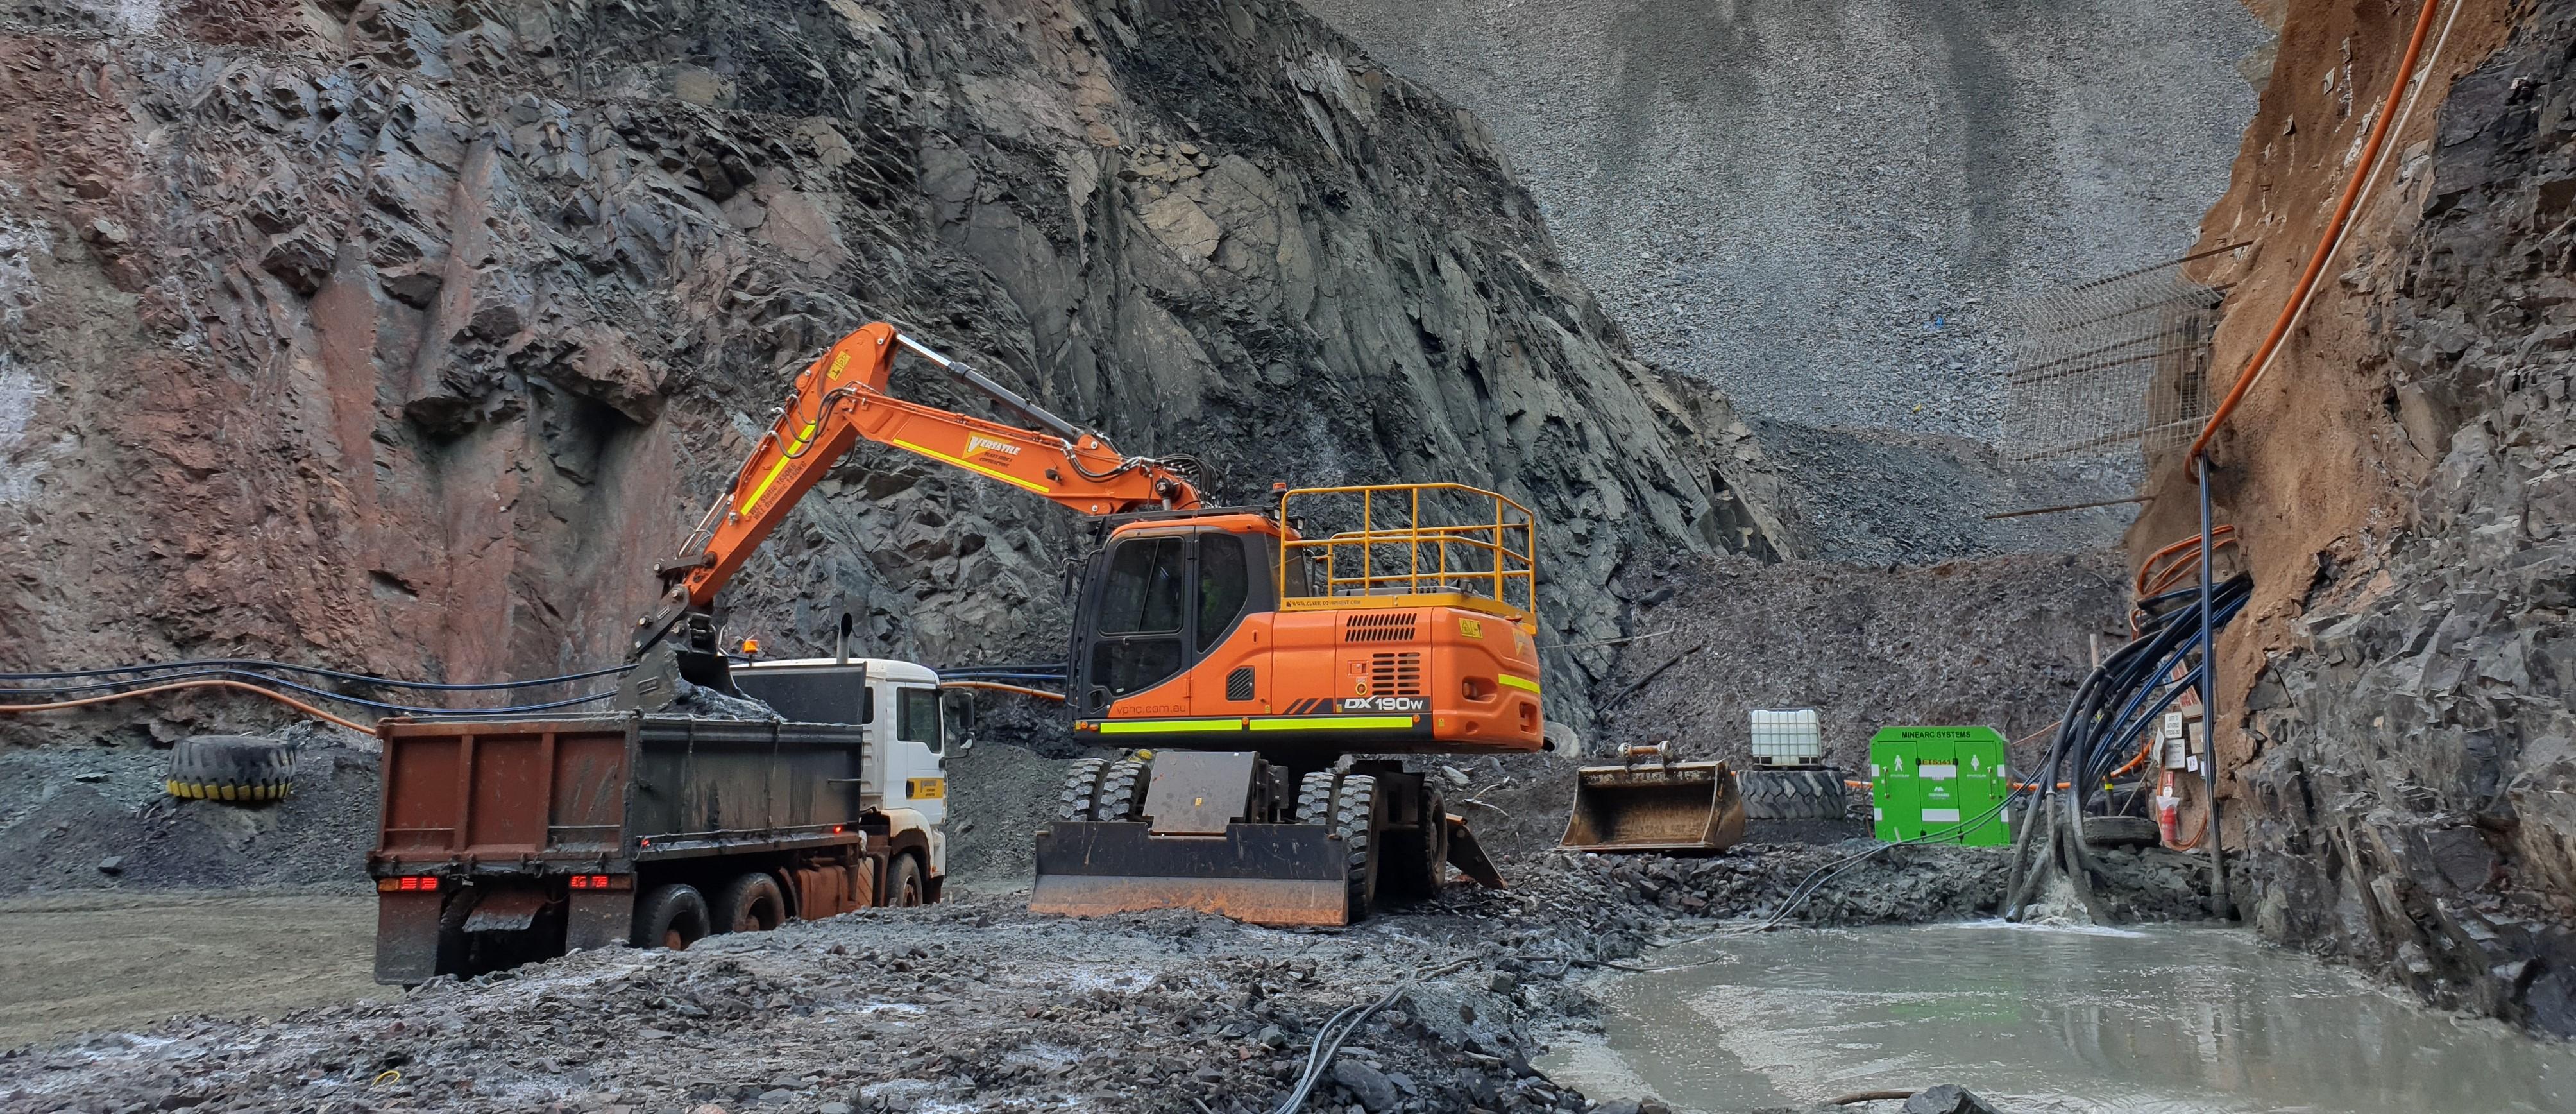 Excavator underground mining